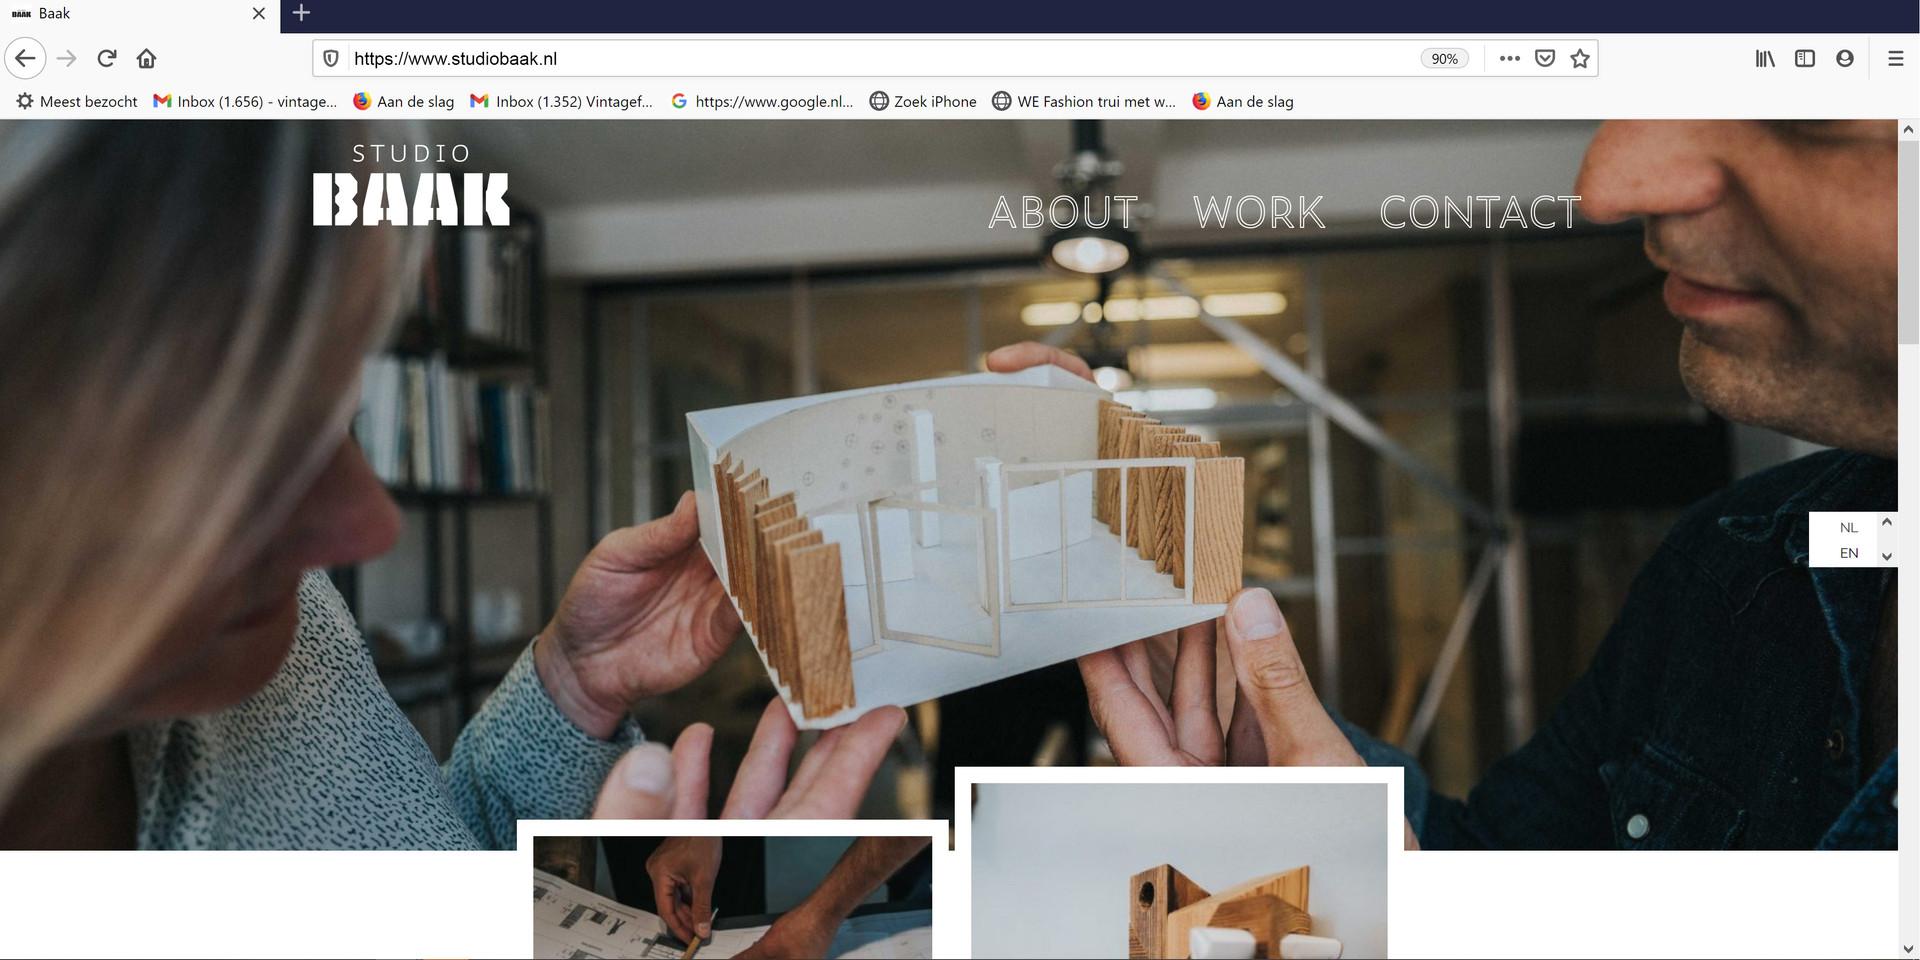 printscreen studiobaak.jpg